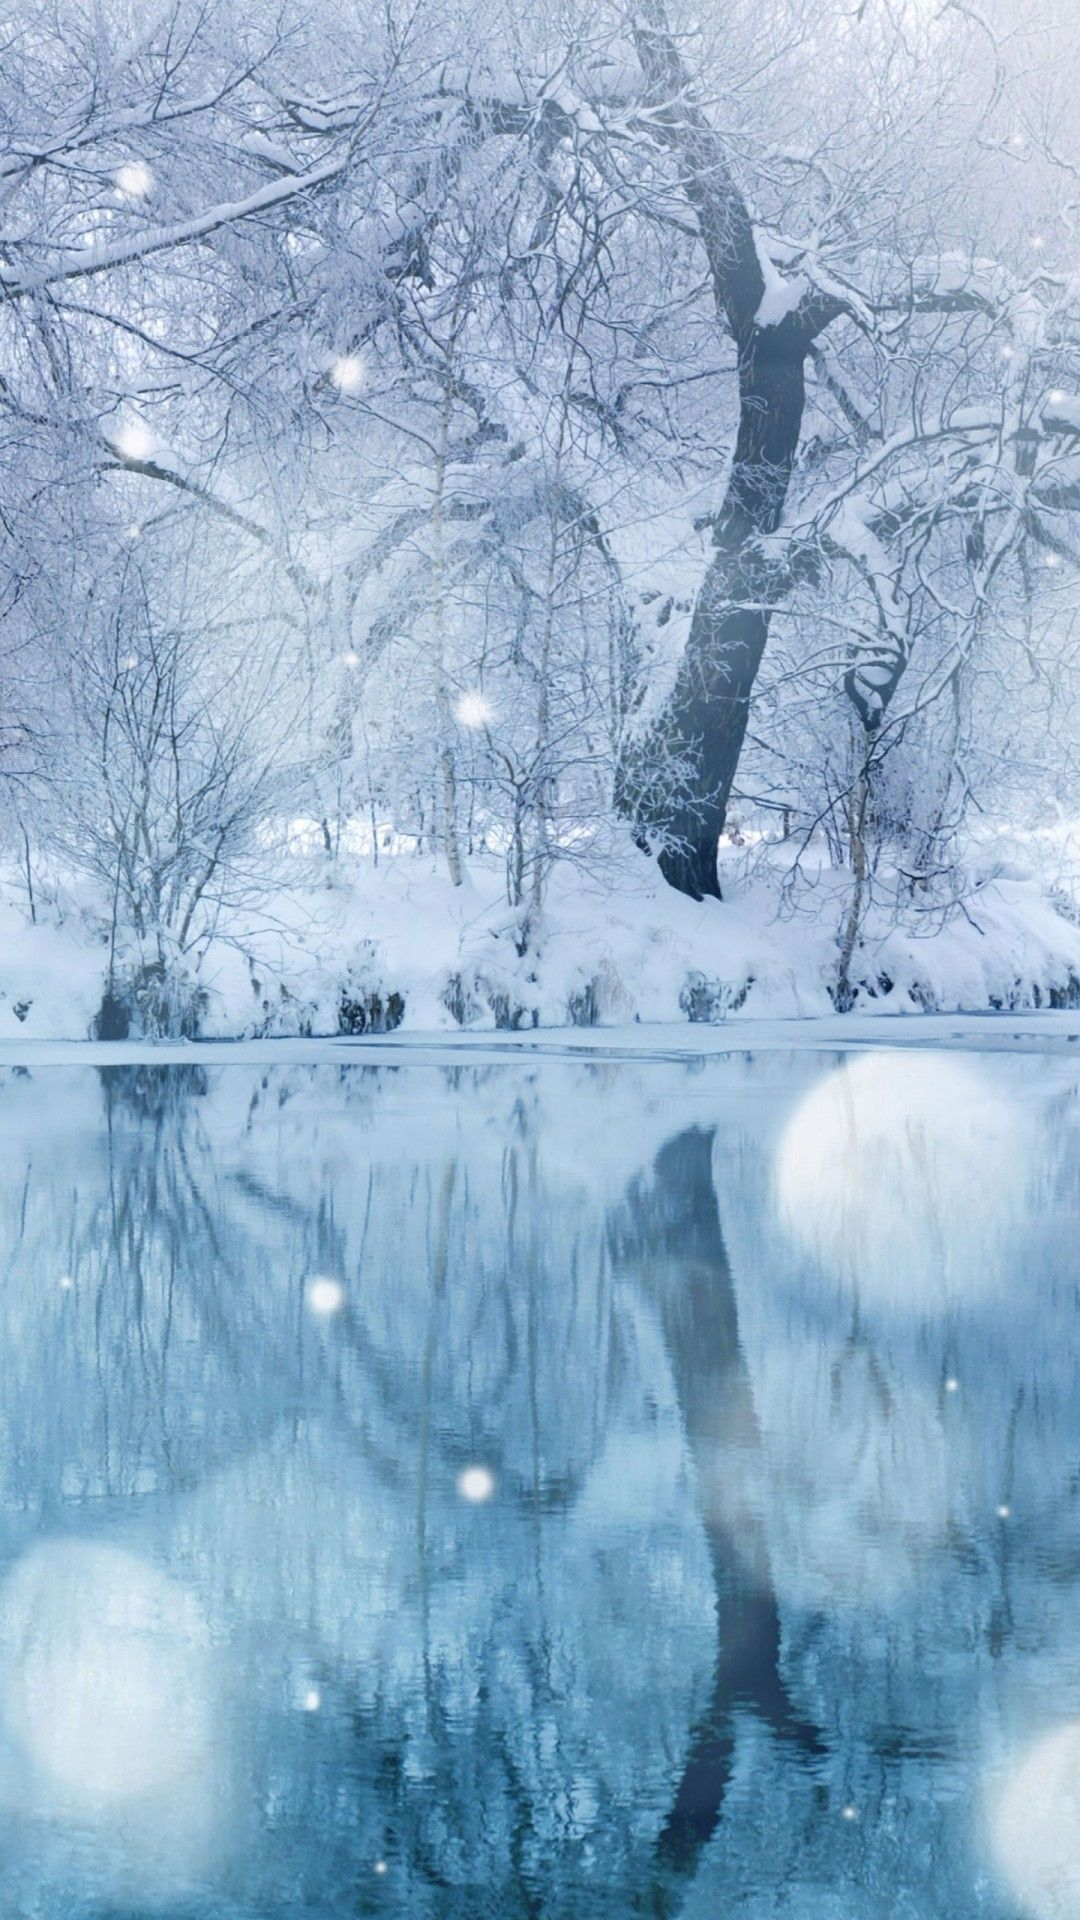 Iphone Wallpaper Winter 427 Winter Wonderland Wallpaper Winter Wallpaper Iphone Wallpaper Winter